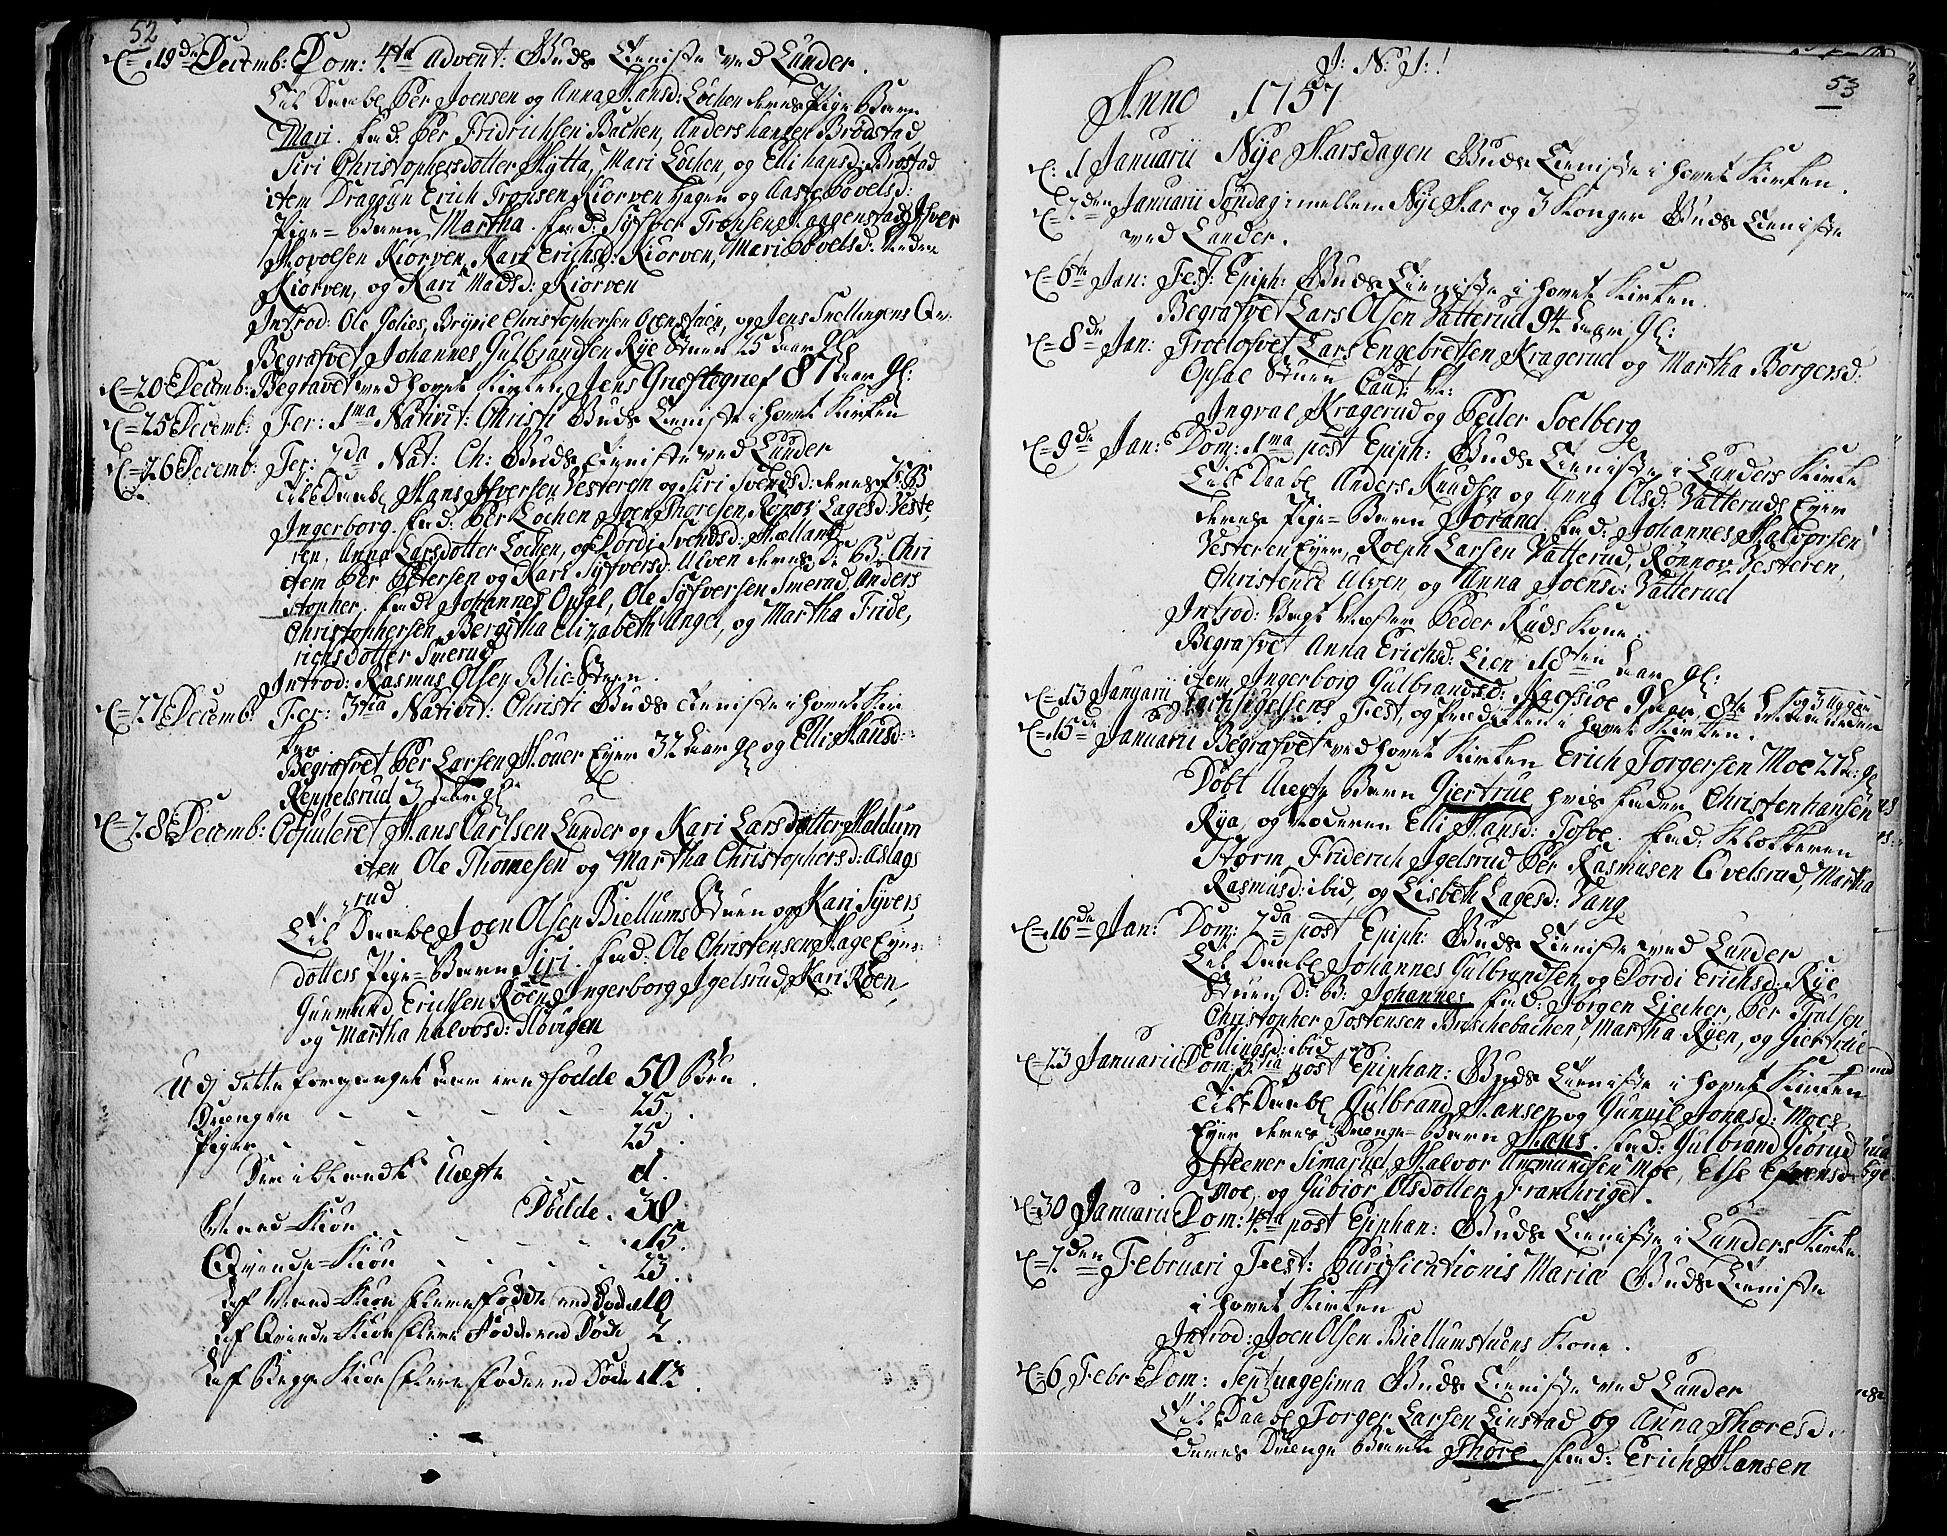 SAH, Jevnaker prestekontor, Ministerialbok nr. 3, 1752-1799, s. 52-53